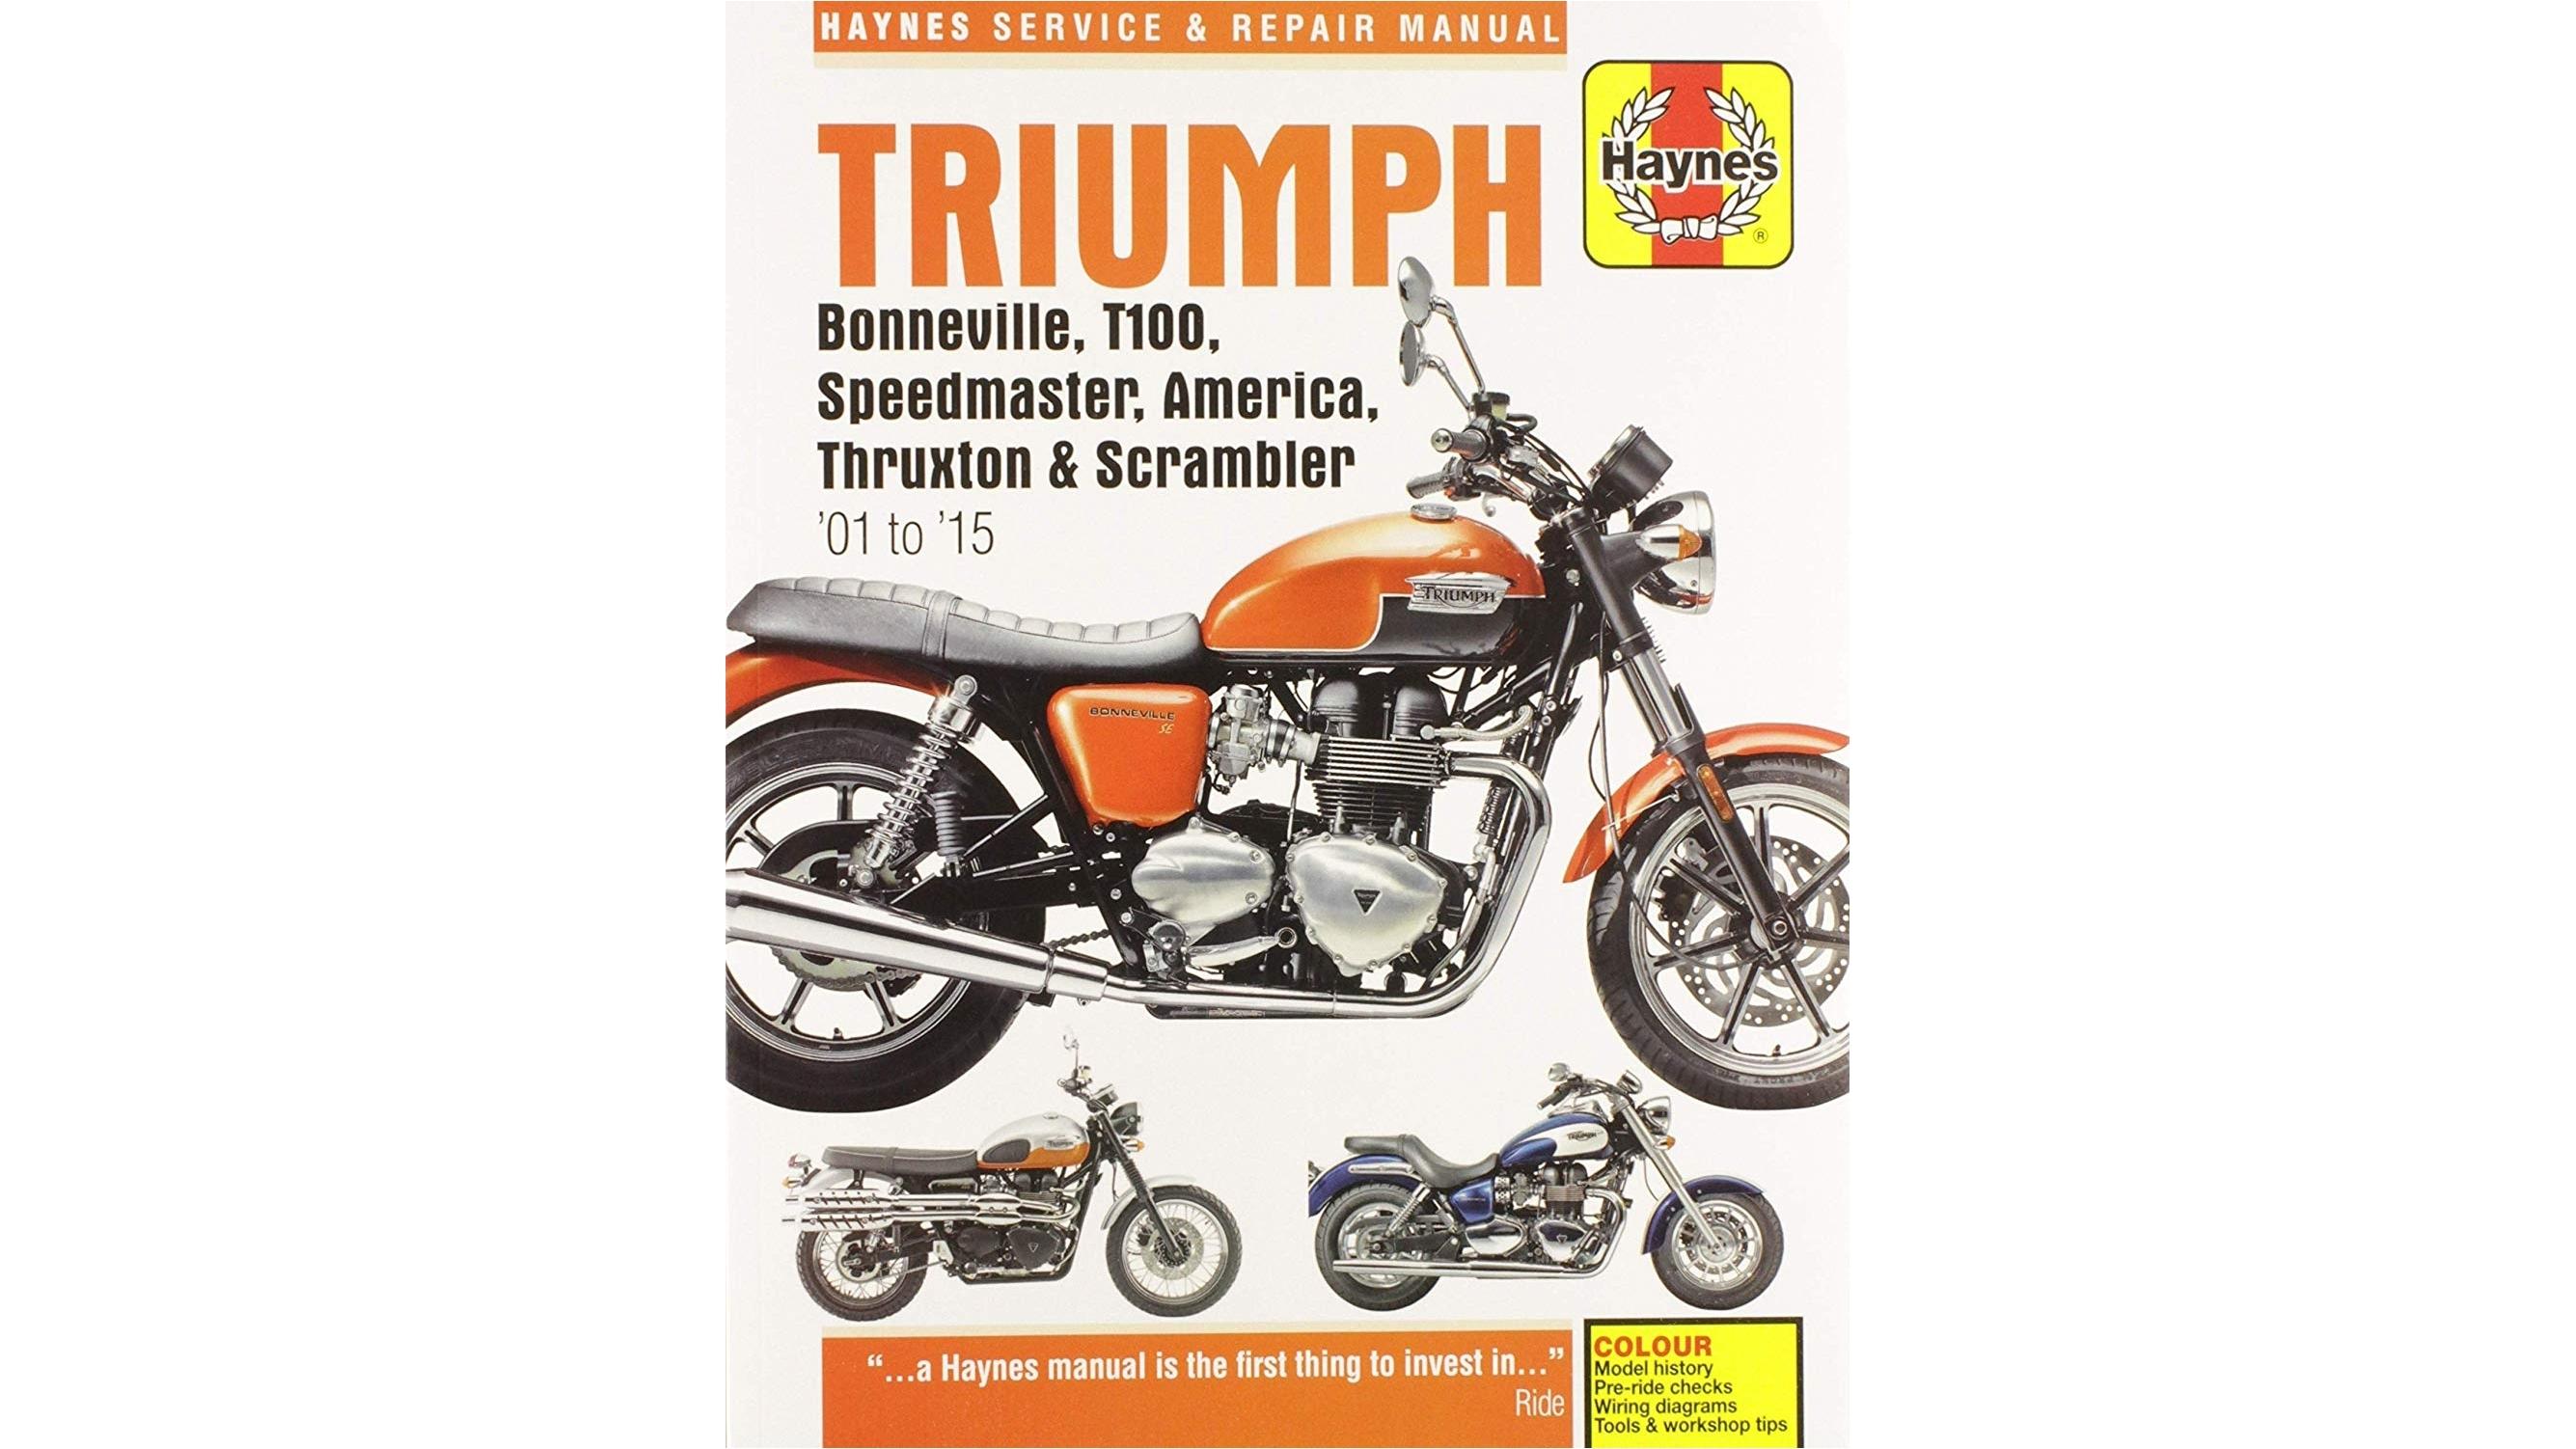 Triumph Motorcycle Wiring Diagram On Triumph T120 Wiring Diagram